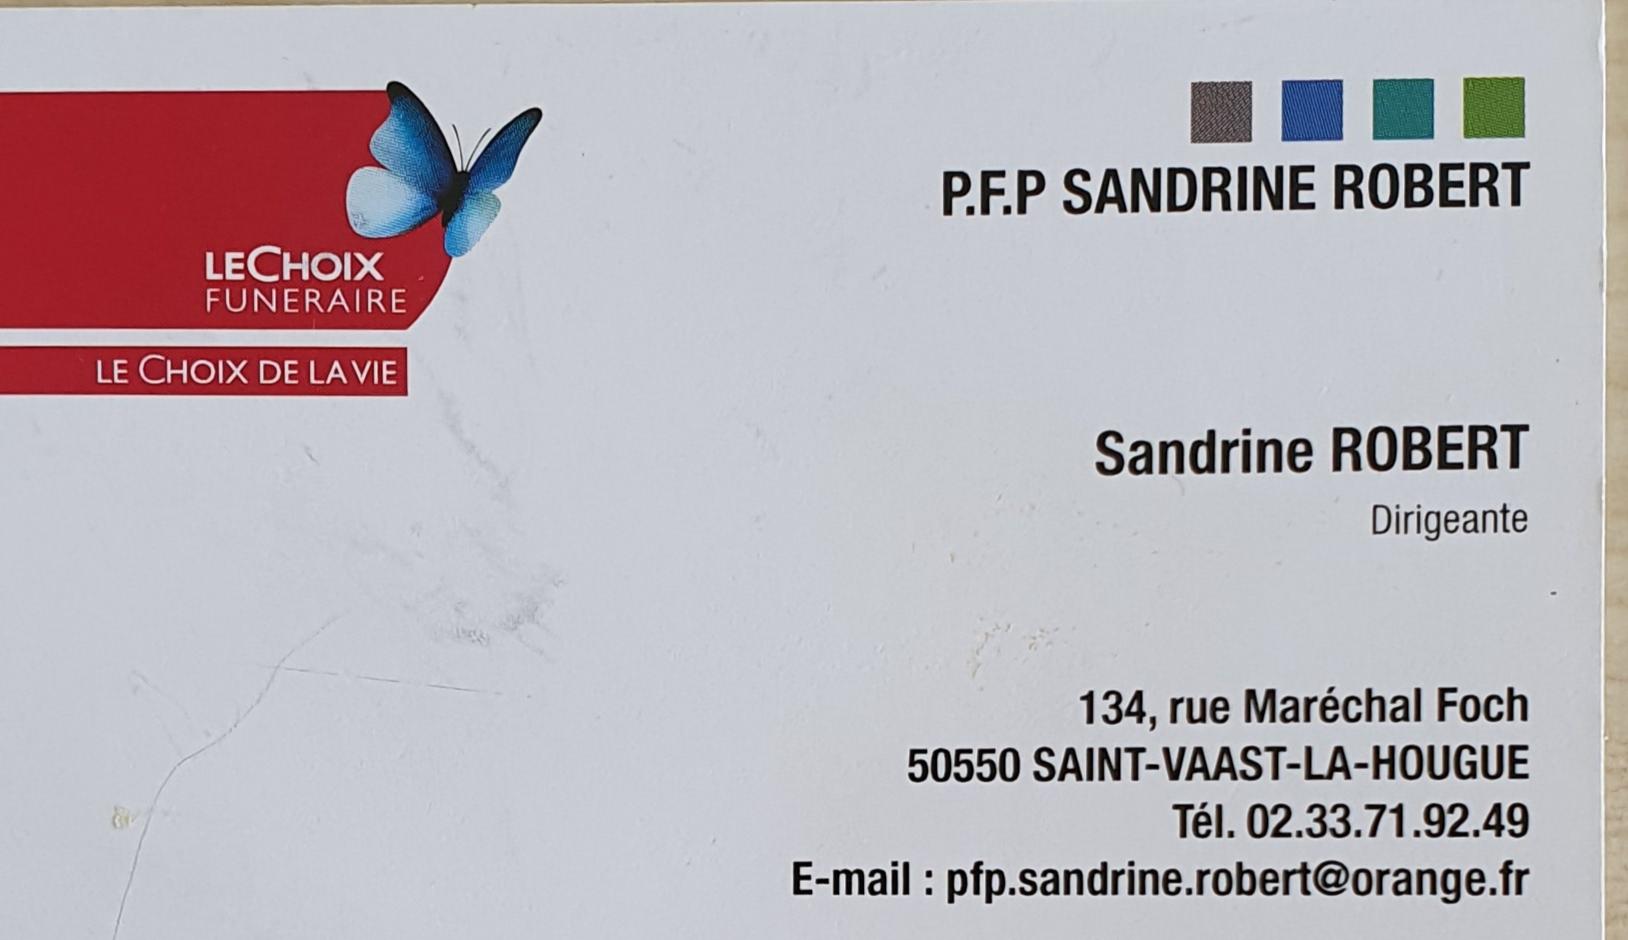 P.F.P. Sandrine Robert